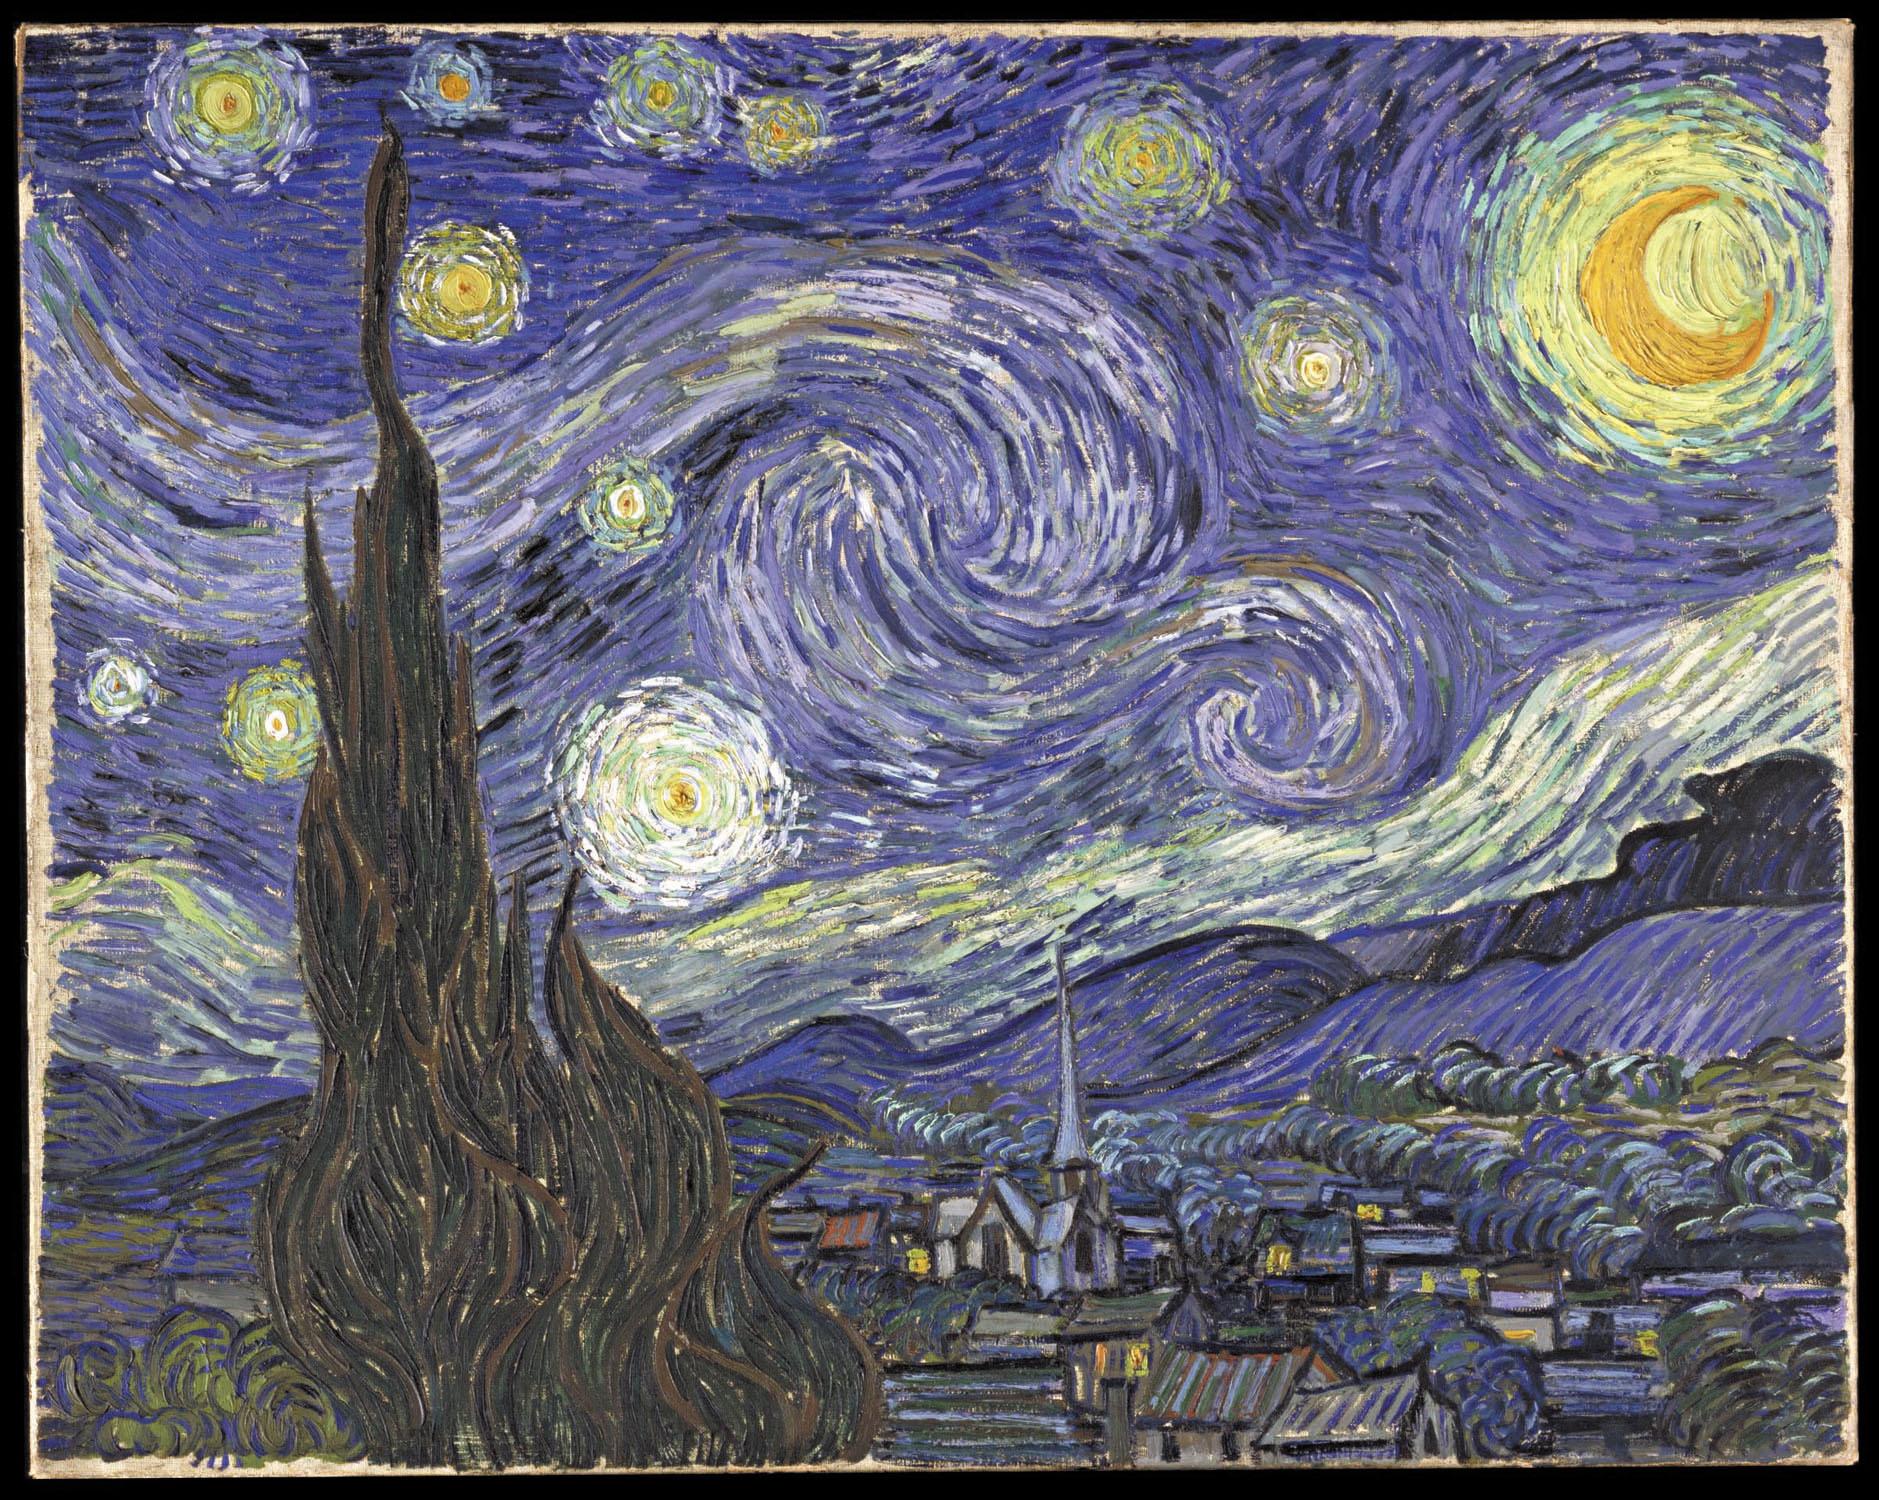 APOD 11 Oktober 2009 De Sterrennacht Van Vincent Gogh